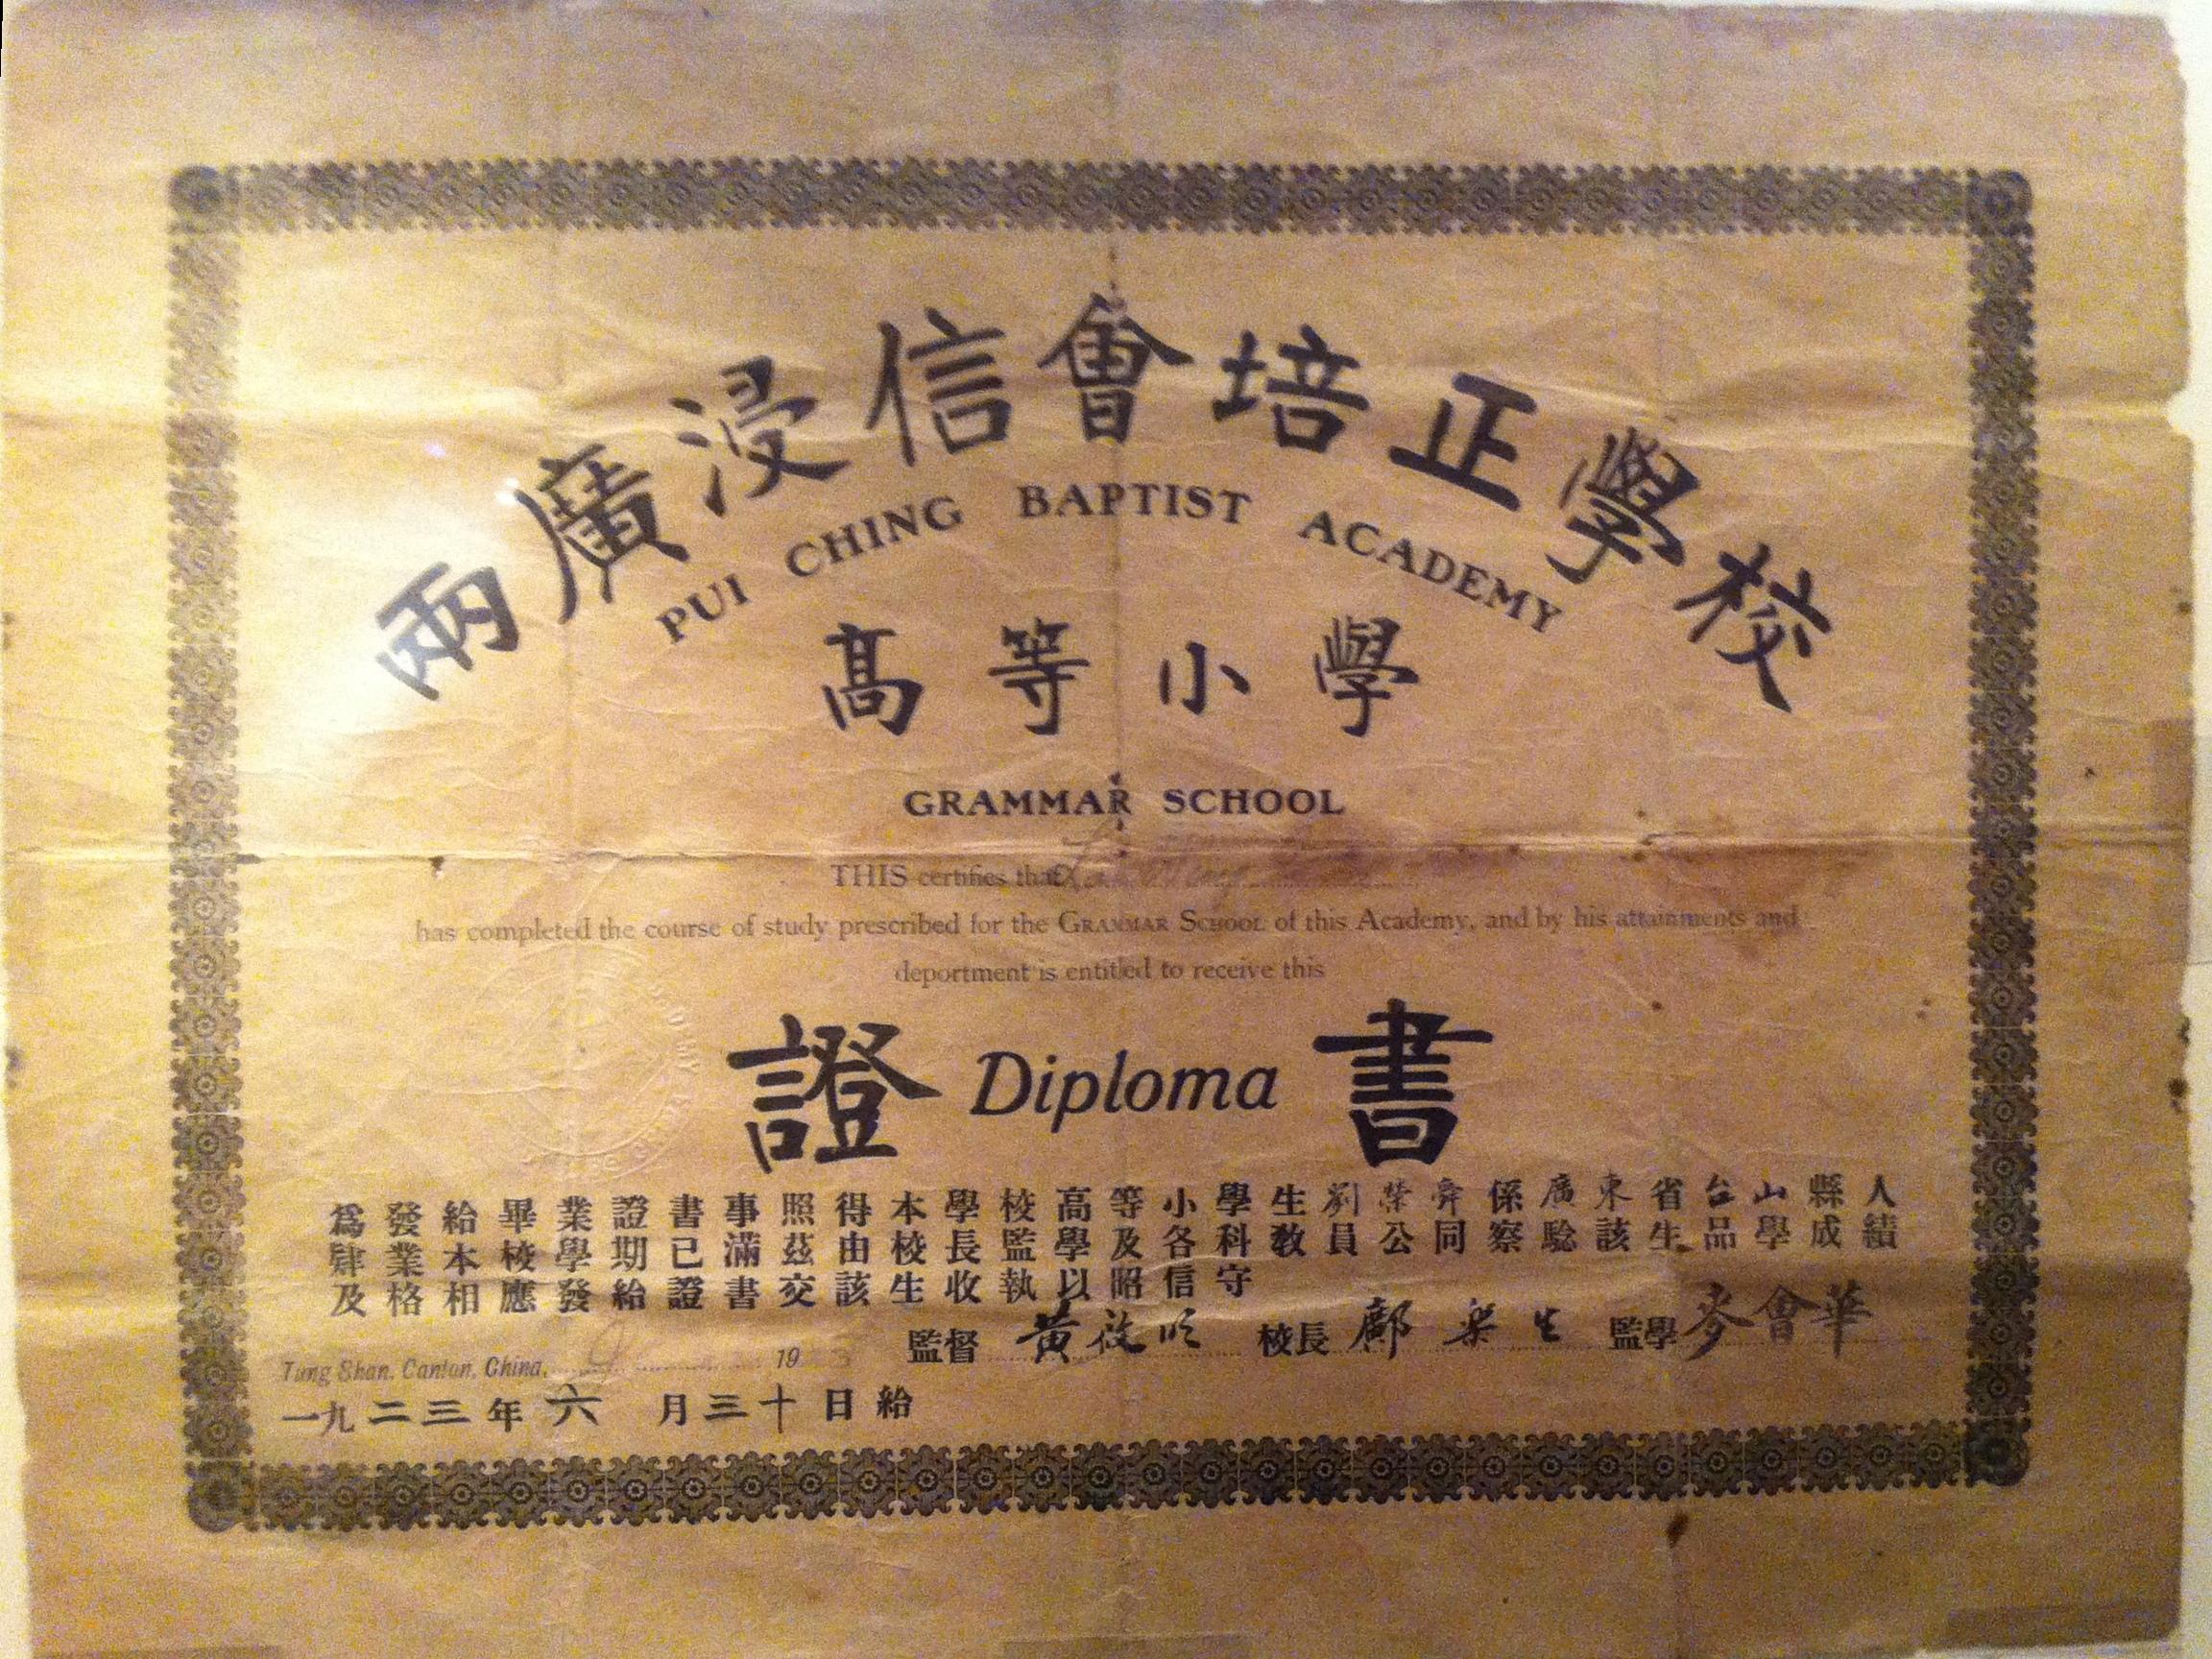 file hk central dr sun yat sen museum exhit 兩廣 浸信會 培正學校  current 01 28 18 2011